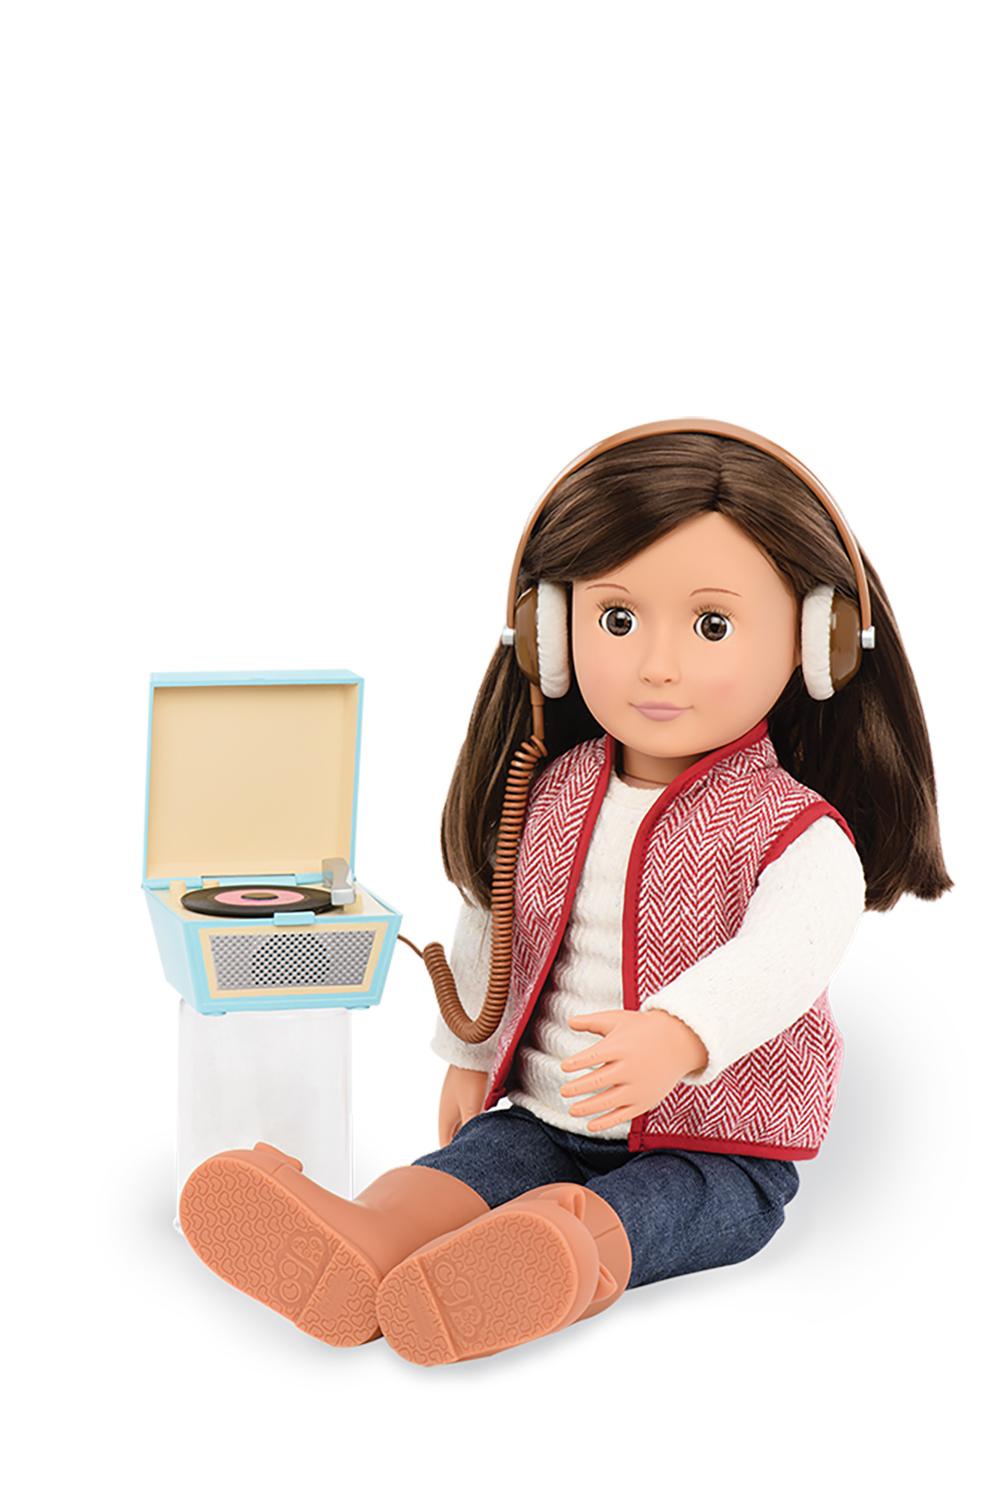 Retro Accessories OG - Retro Records for 18 Doll